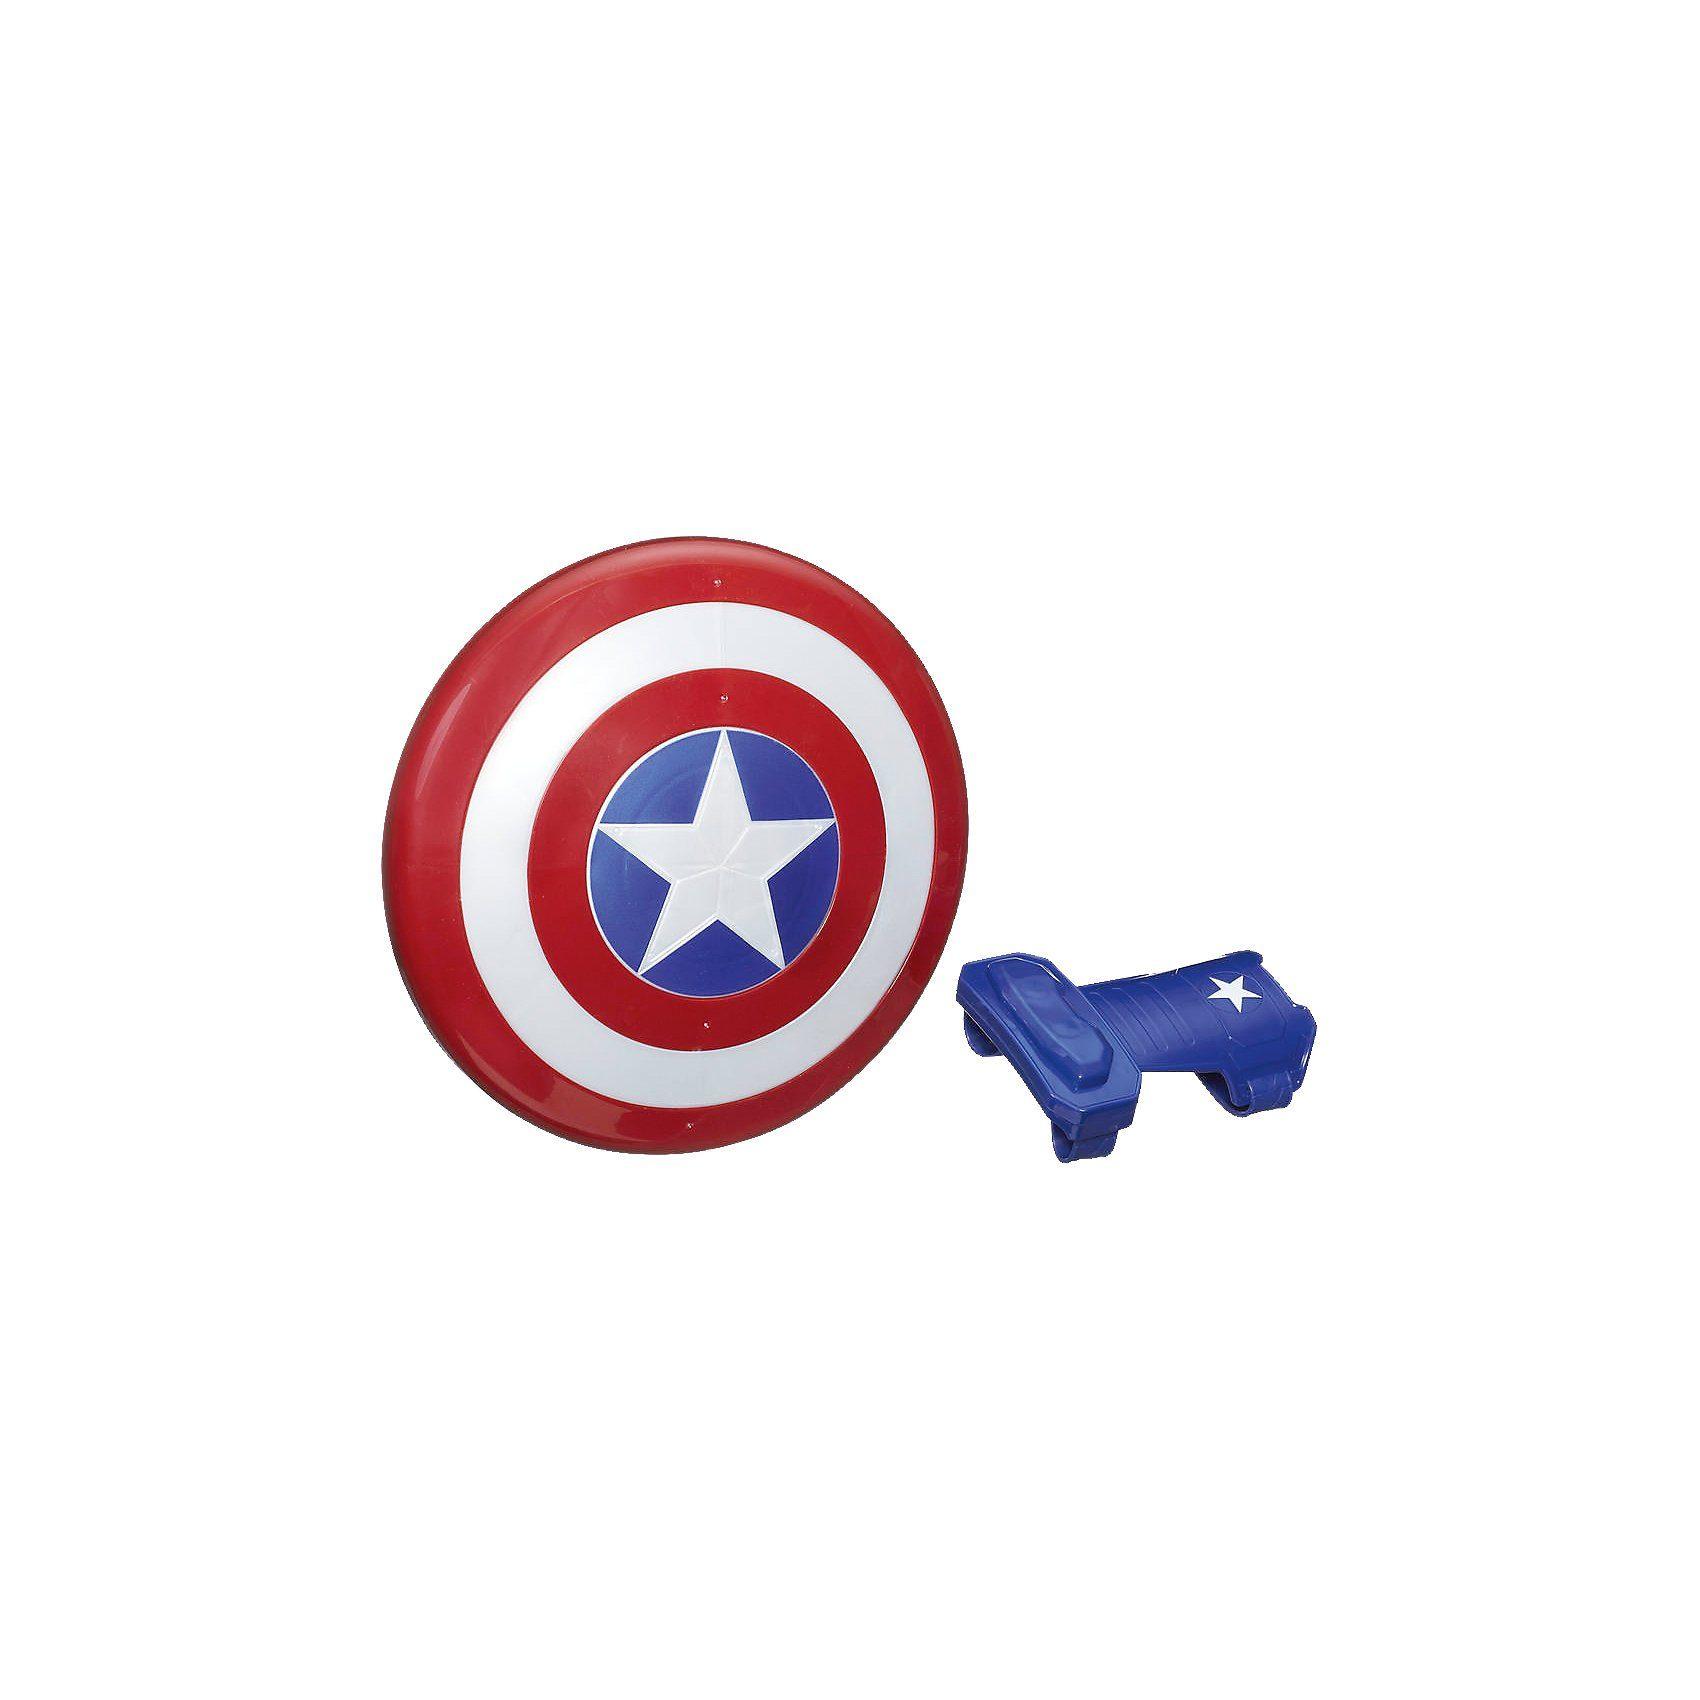 Hasbro Avengers Captain America magnetisches Schild